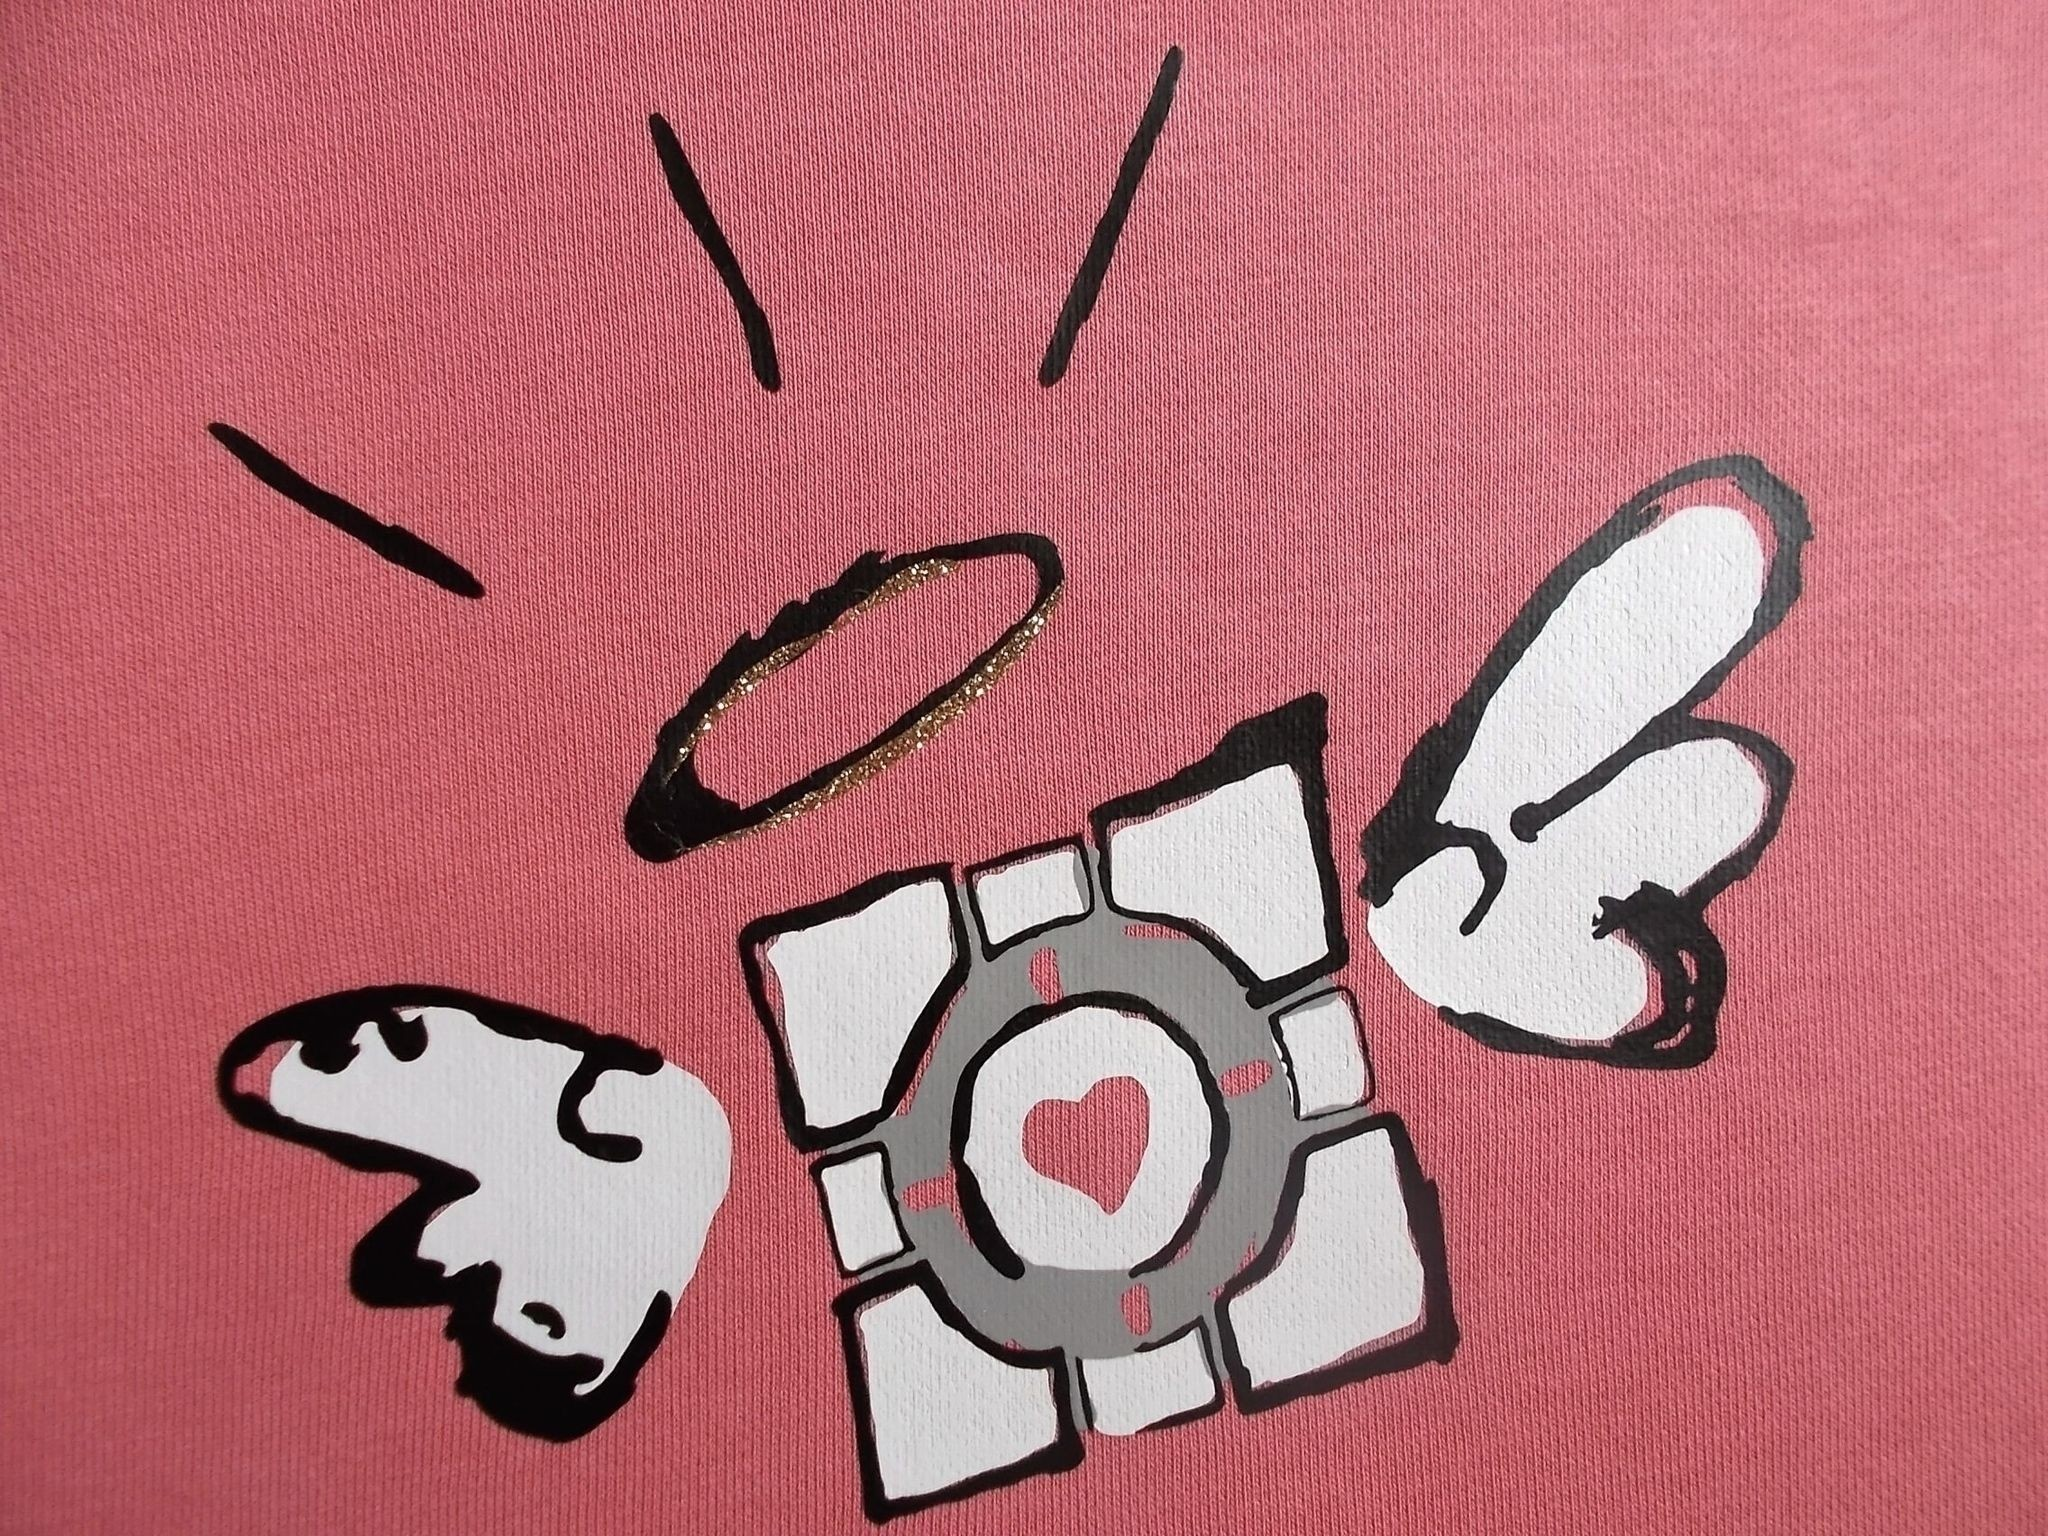 Companion Cube Papercraft Panion Cube Iron Pinterest